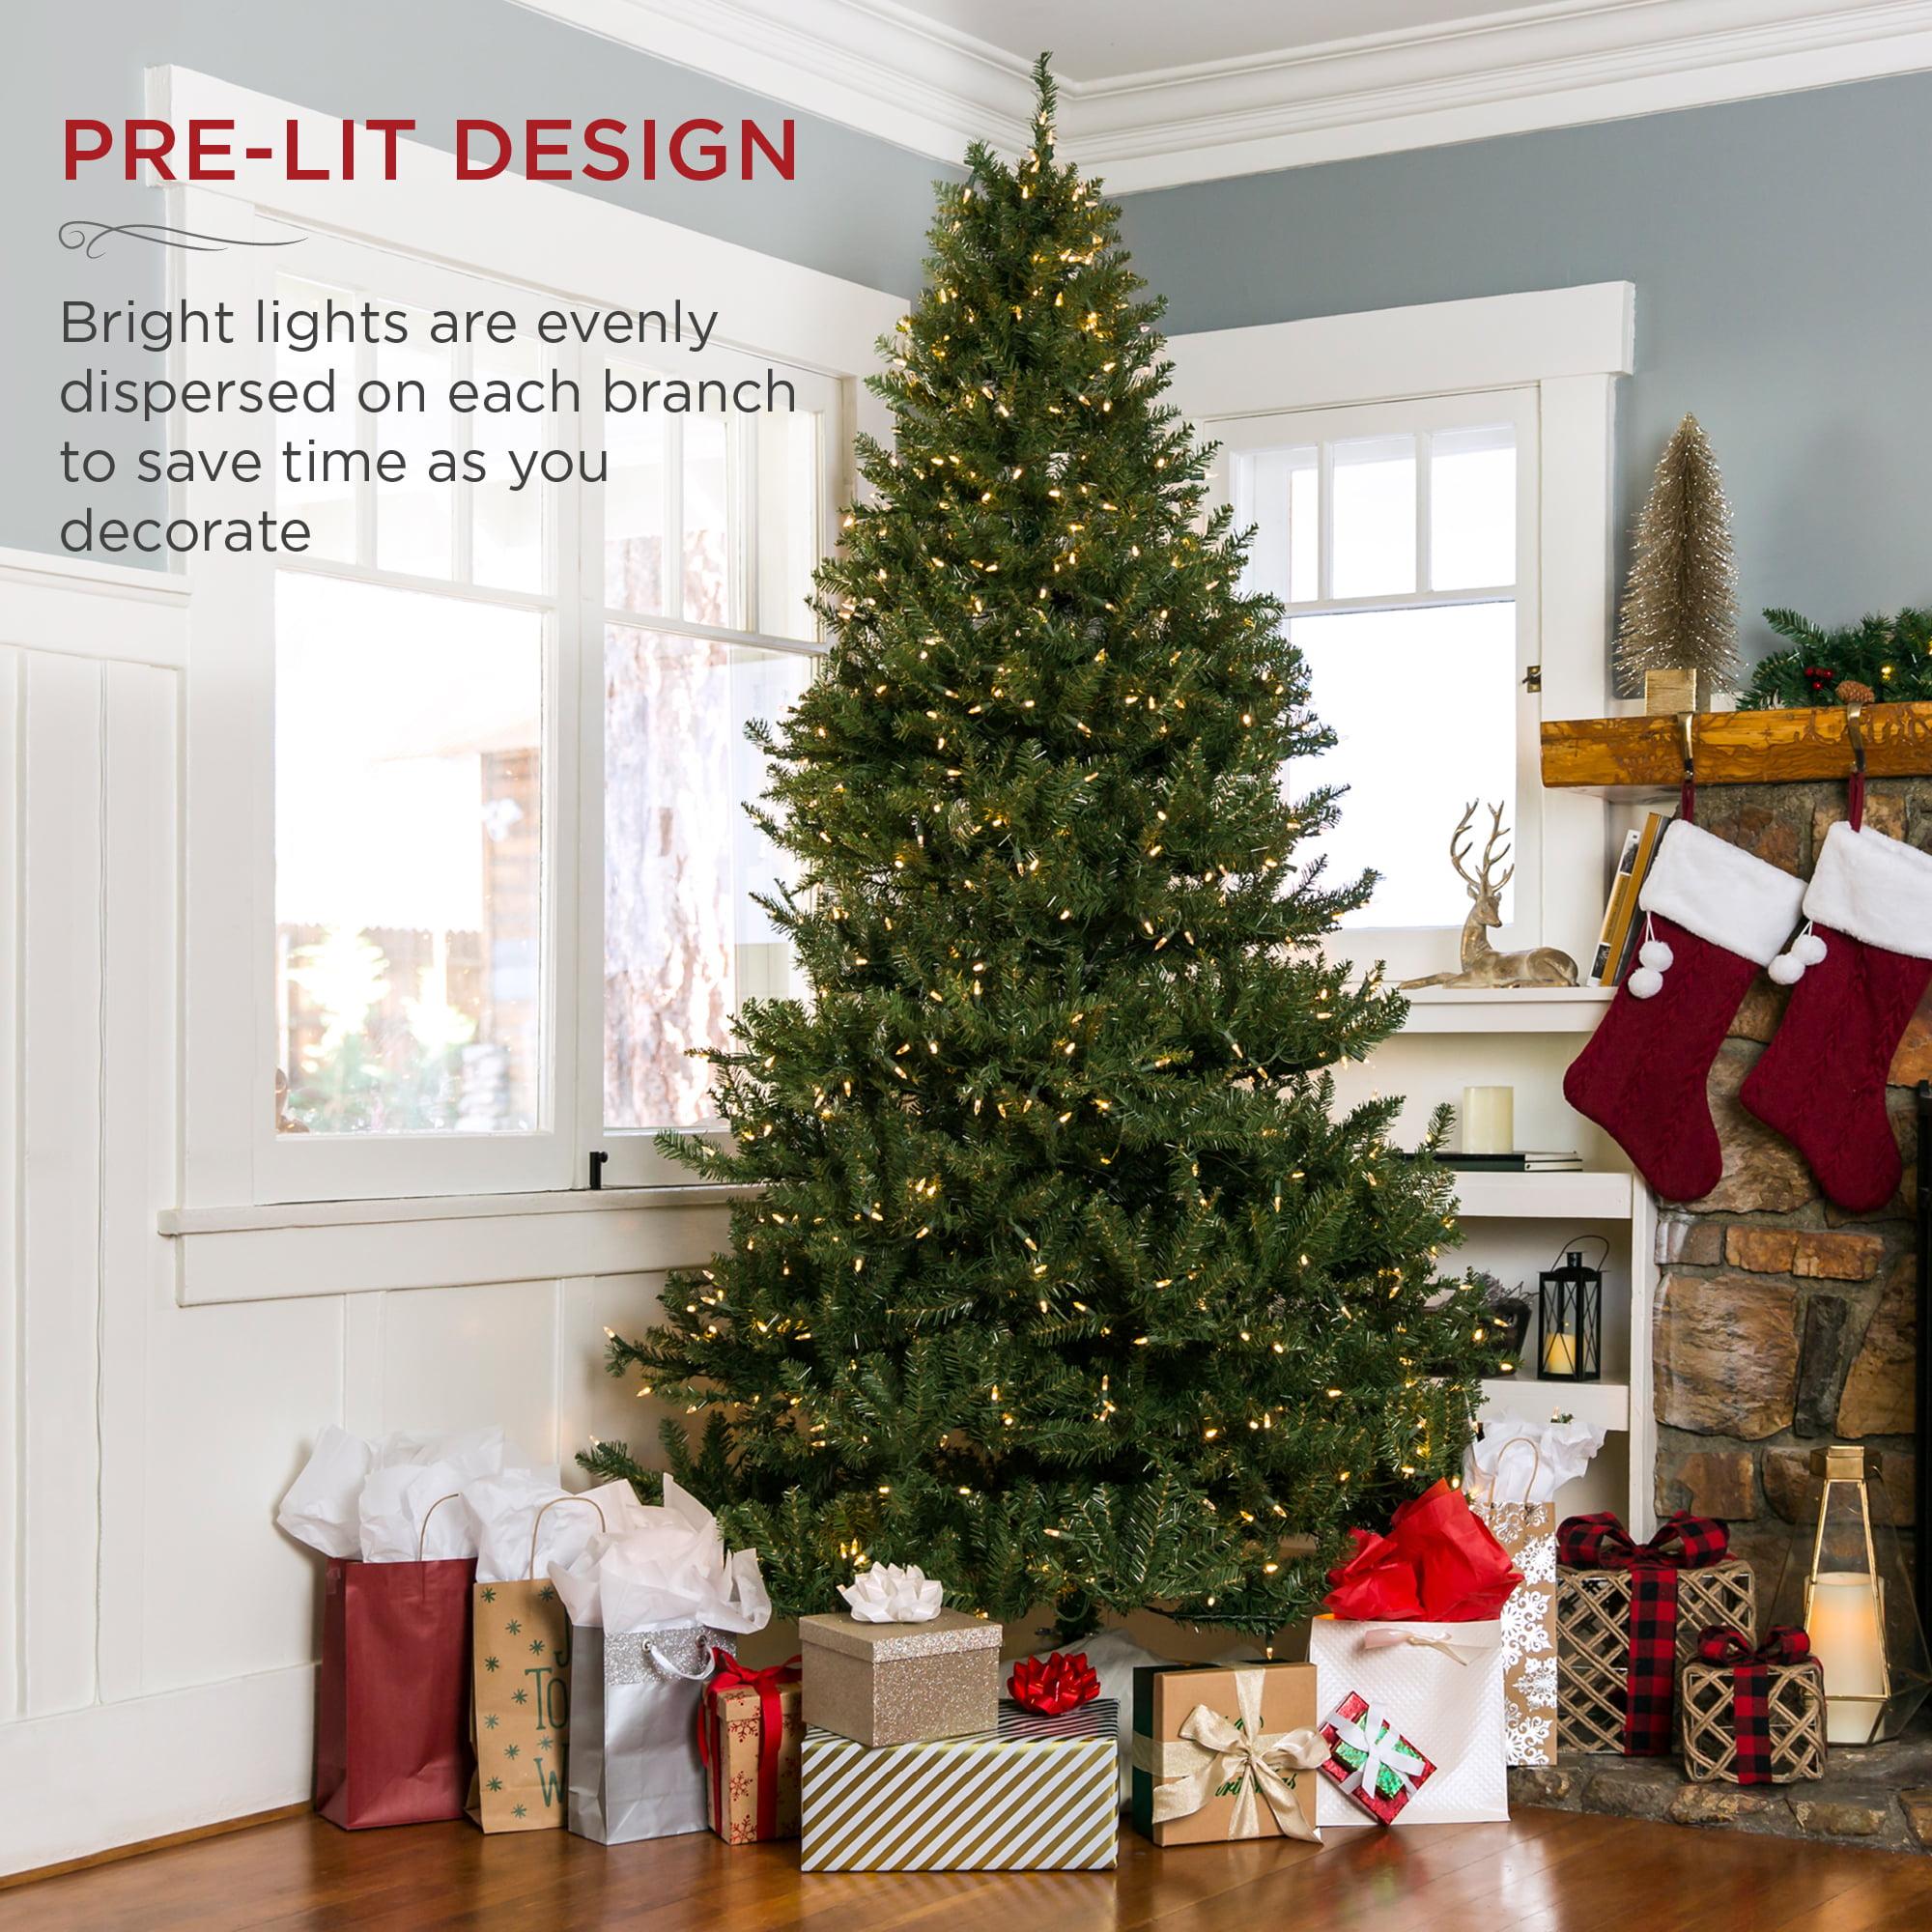 Best Choice Products 6ft Pre Lit Hinged Douglas Full Fir Artificial Christmas Tree Holiday Decoration W 450 Lights Walmart Com Walmart Com